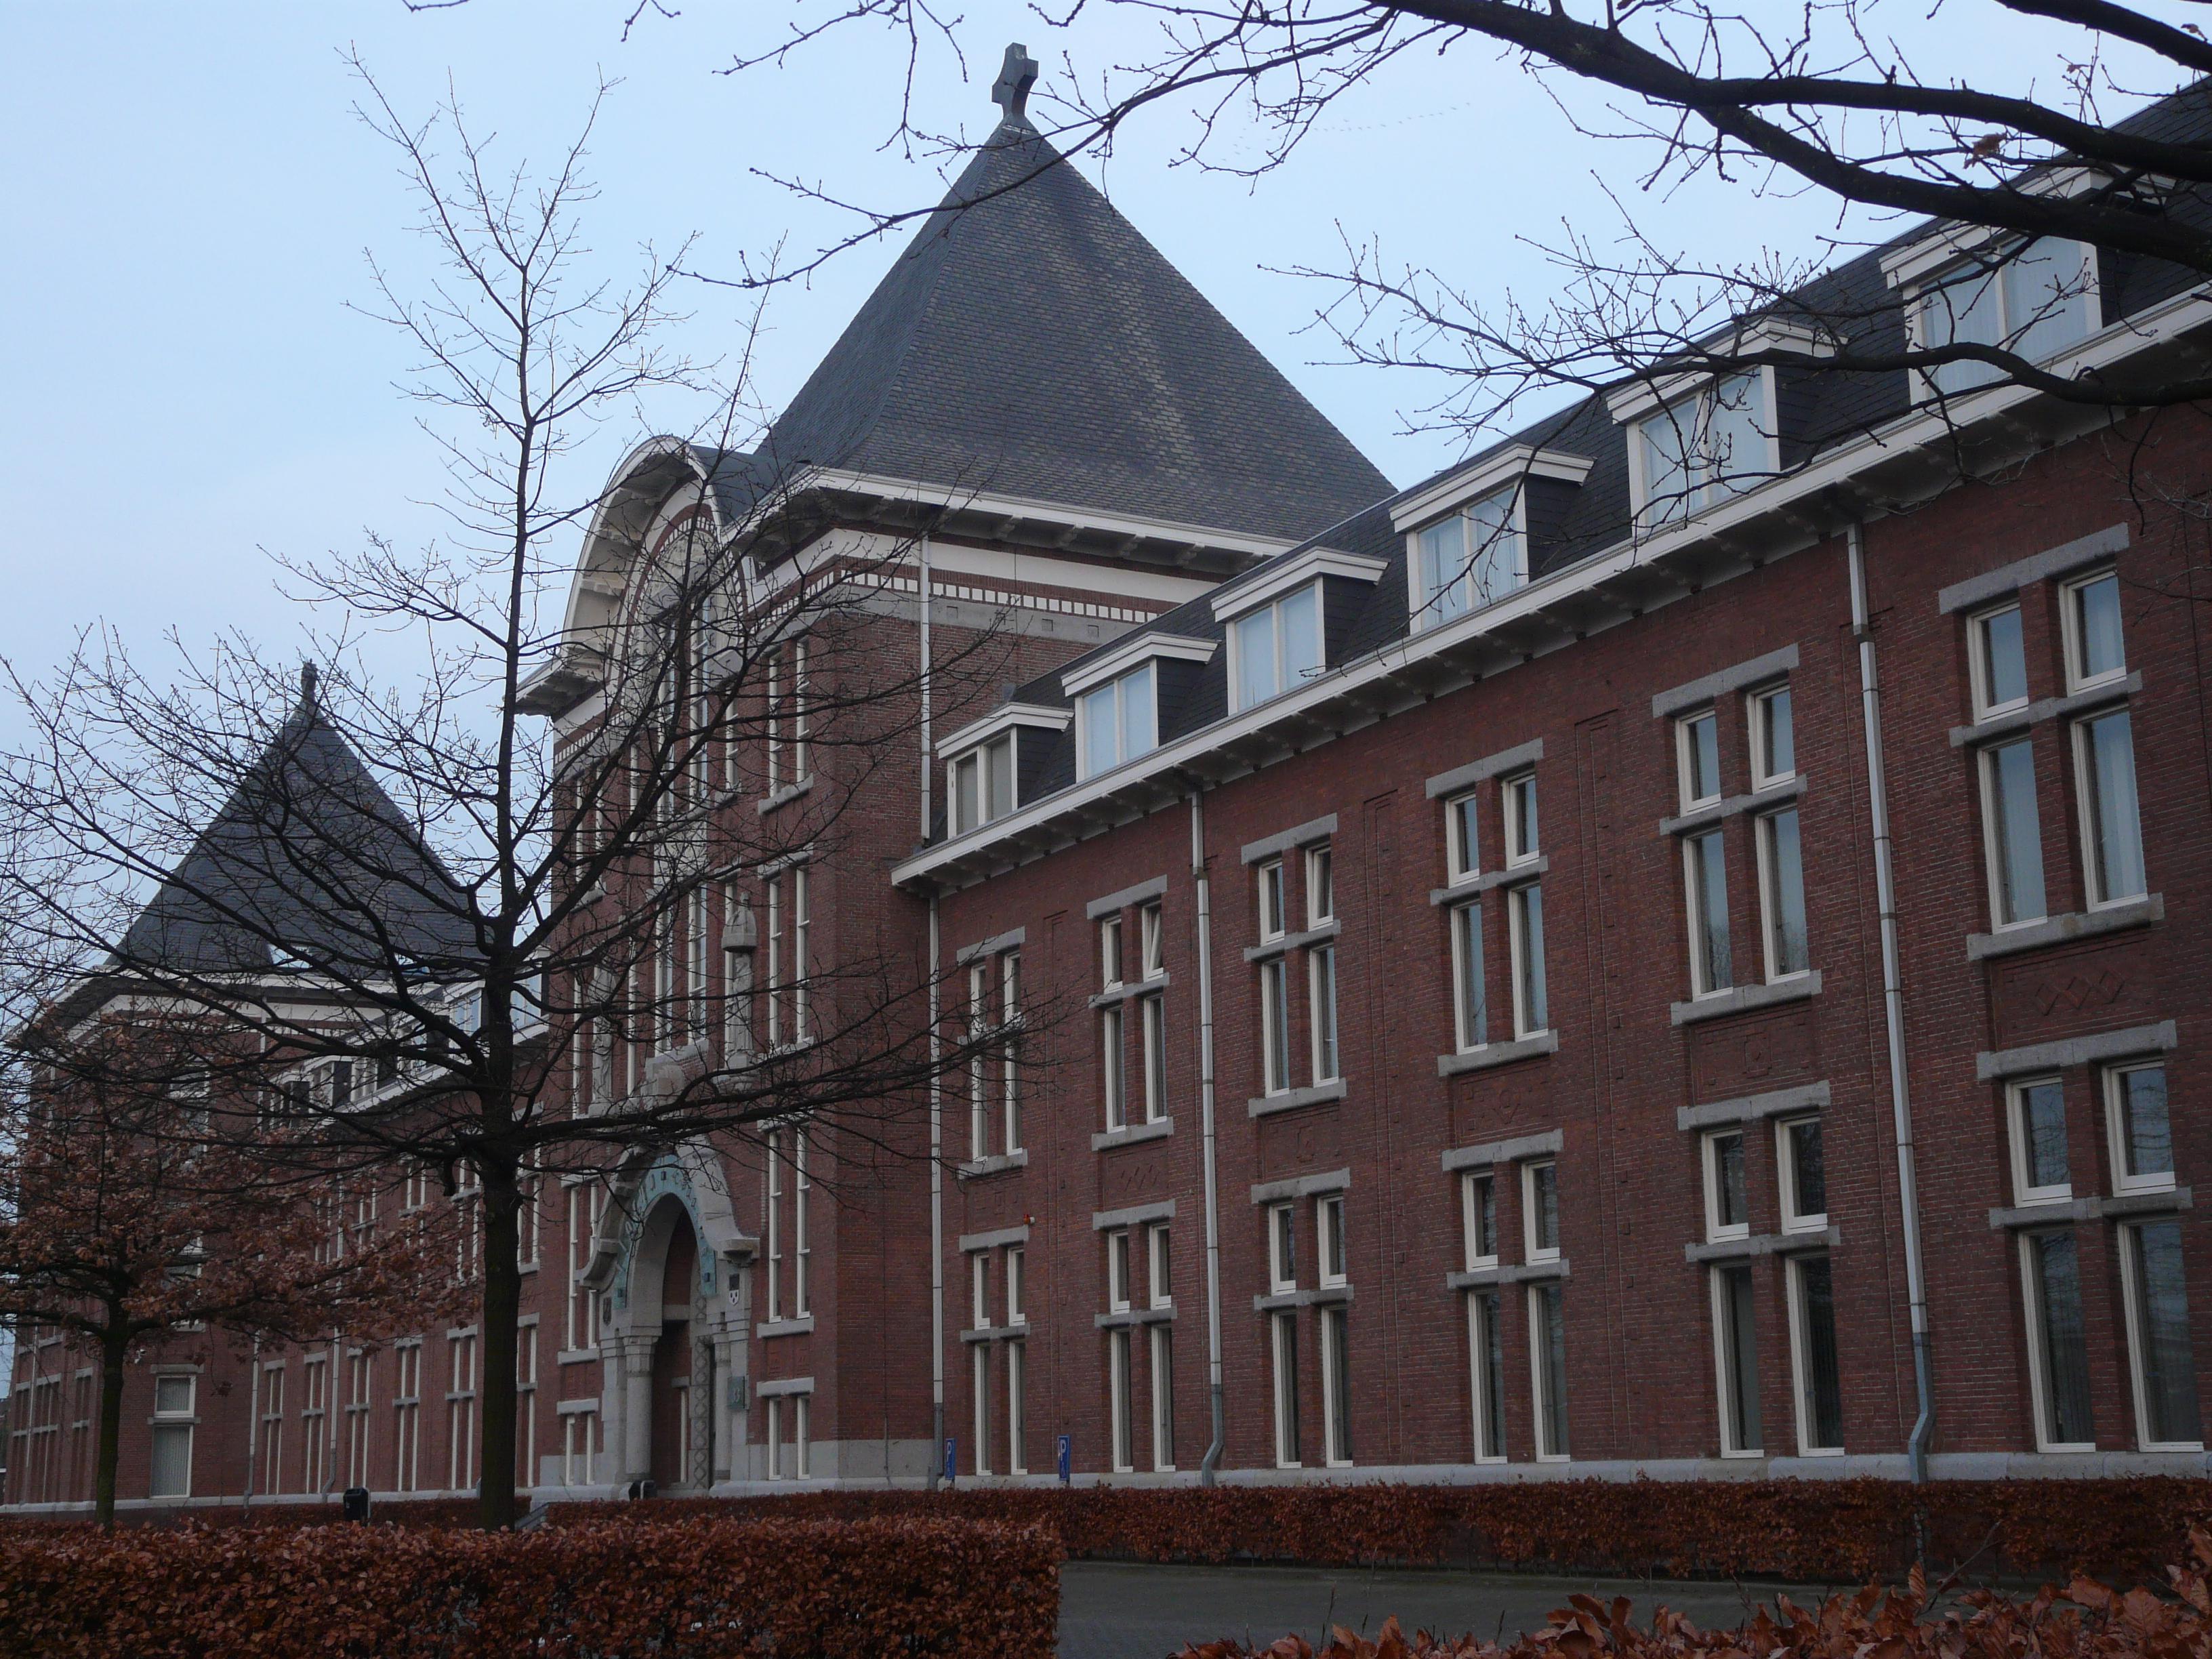 http://upload.wikimedia.org/wikipedia/commons/c/c6/P1010274Florijn_College_Breda.JPG